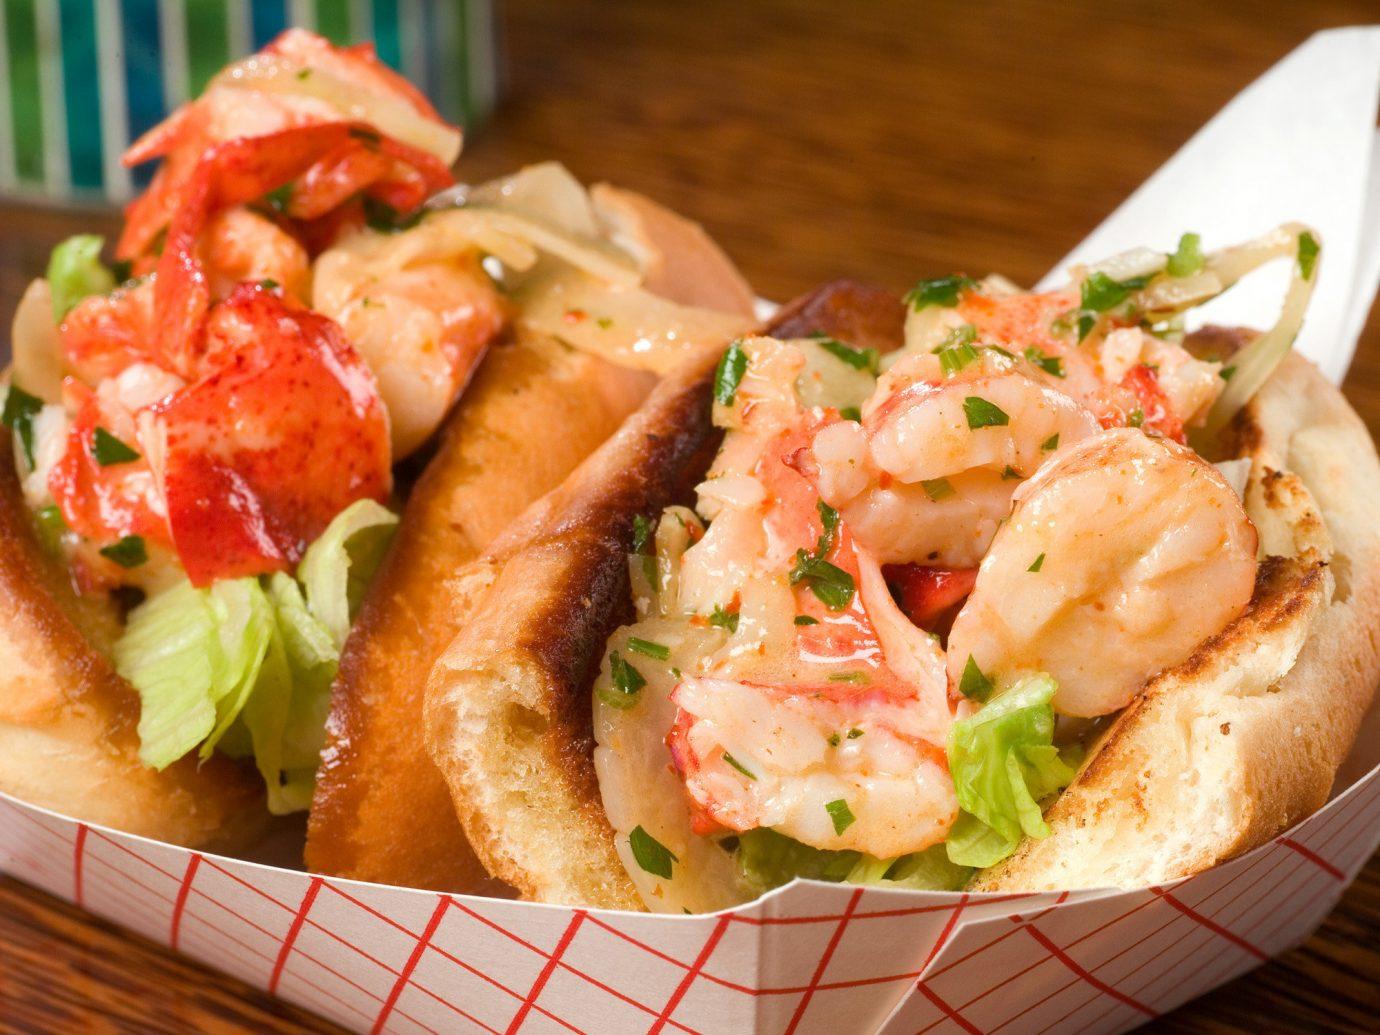 Food + Drink food plate dish indoor shrimp arthropod Seafood cuisine hors d oeuvre caridean shrimp scampi invertebrate bruschetta decapoda meal crustacean animal source foods